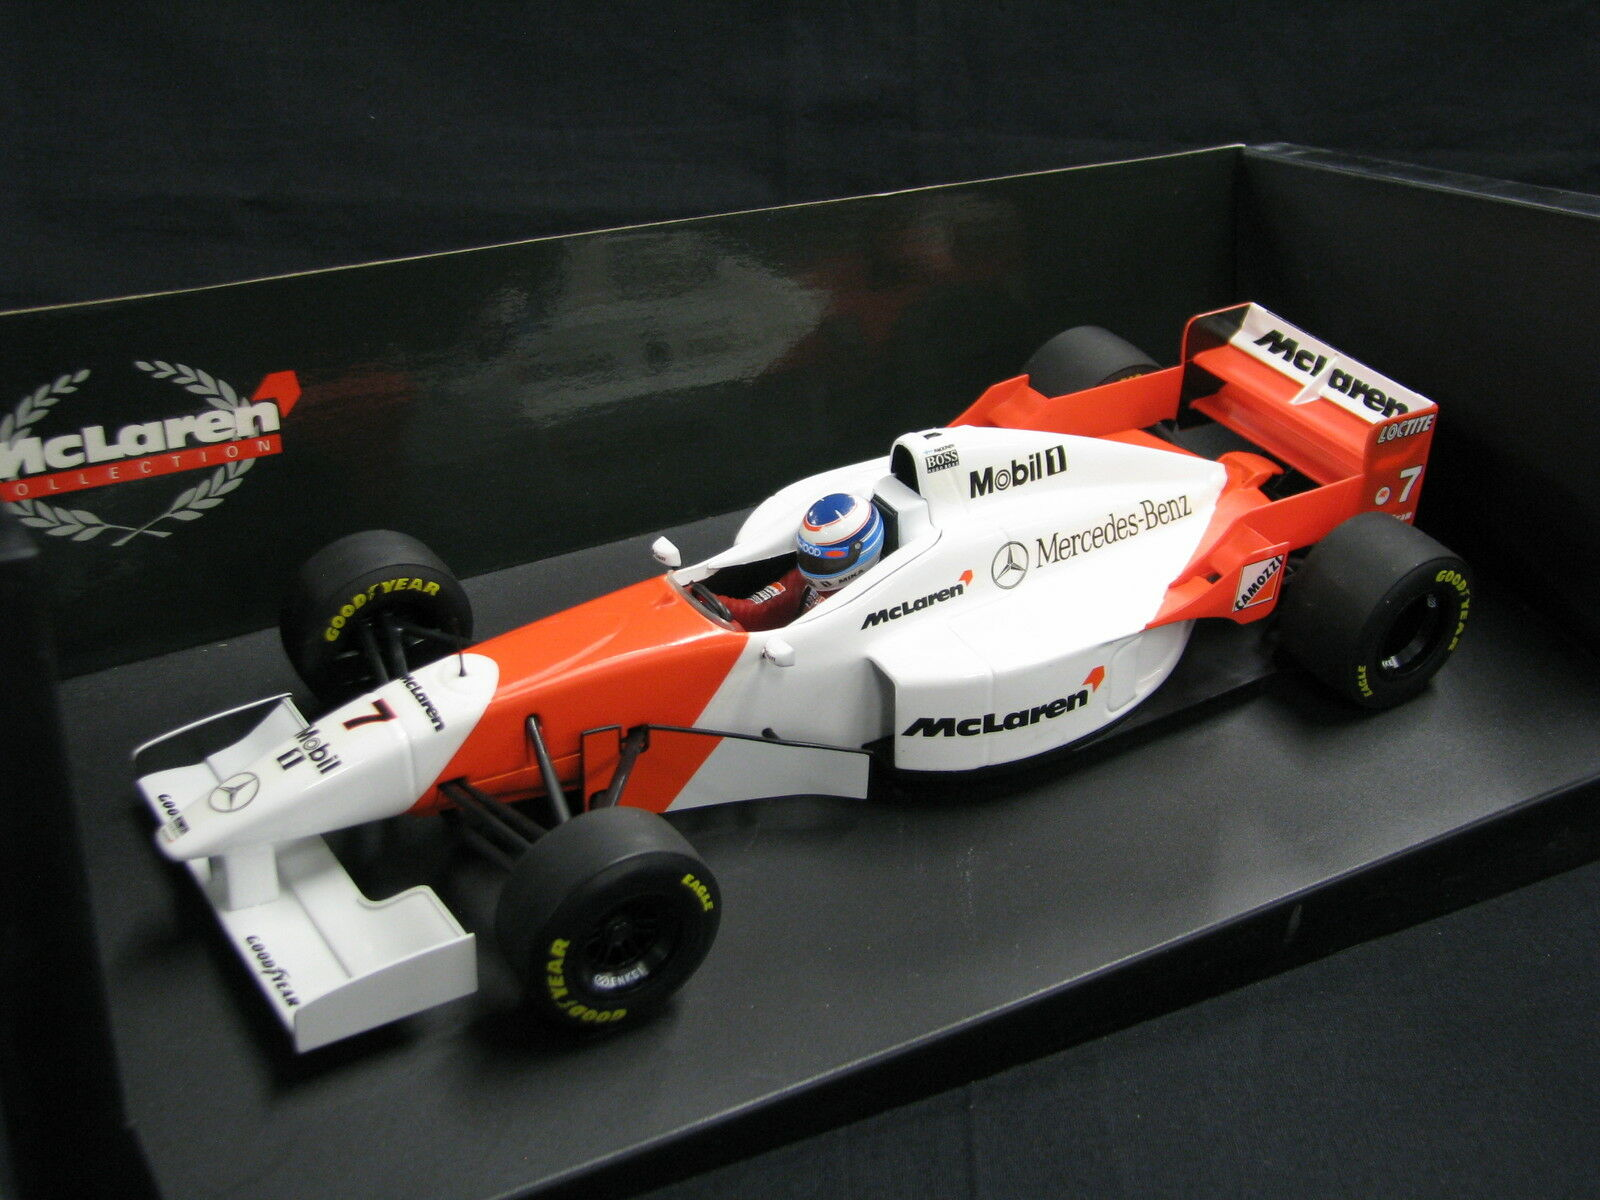 Minichamps McLaren Mercedes MP4 11 1996 1 18  7 Mika Hakkinen (FIN) (JS)